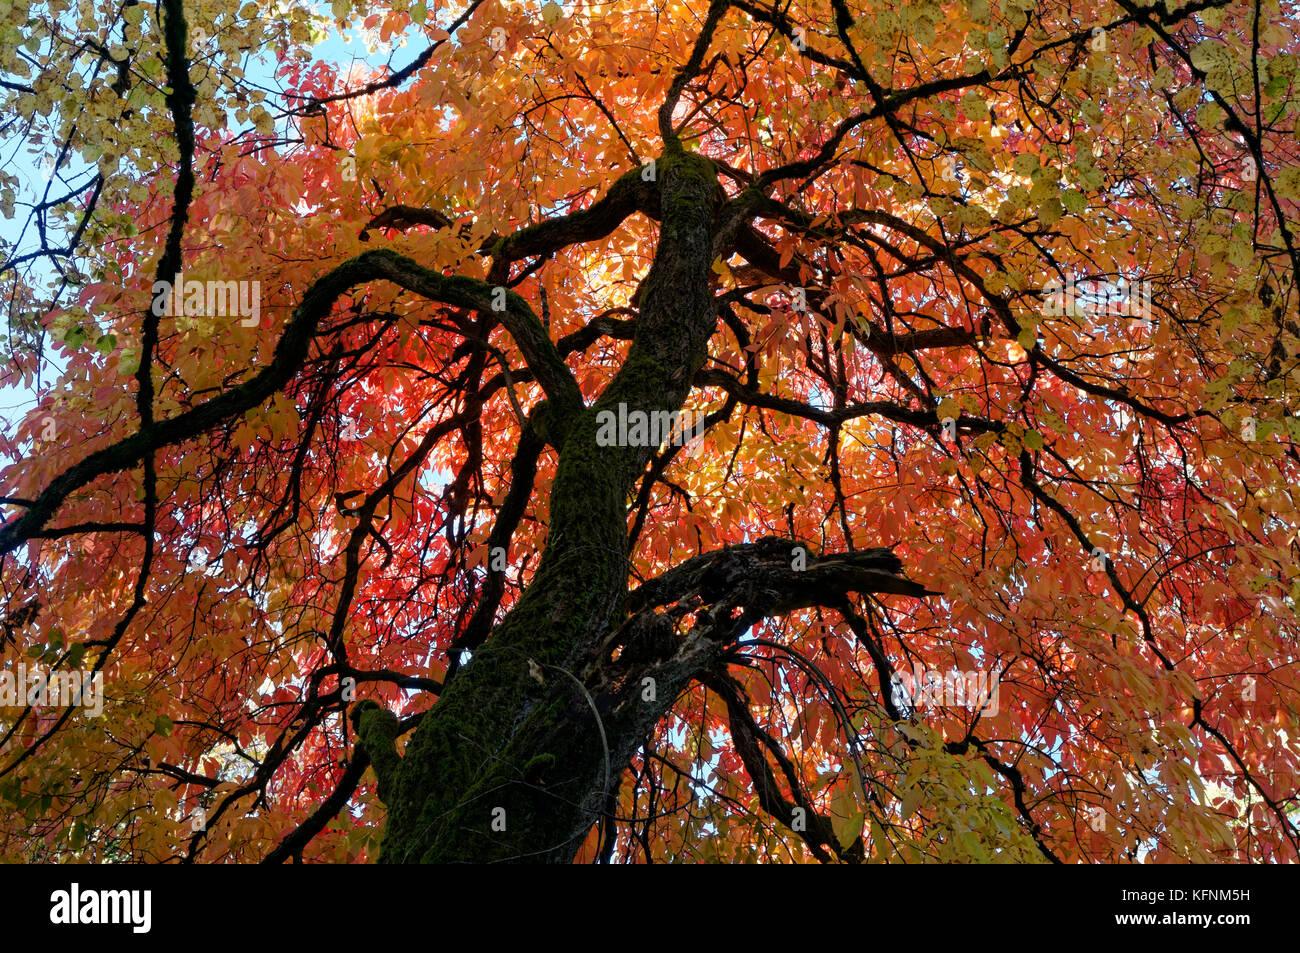 colorful-fall-foliage-of-a-big-leaf-lind